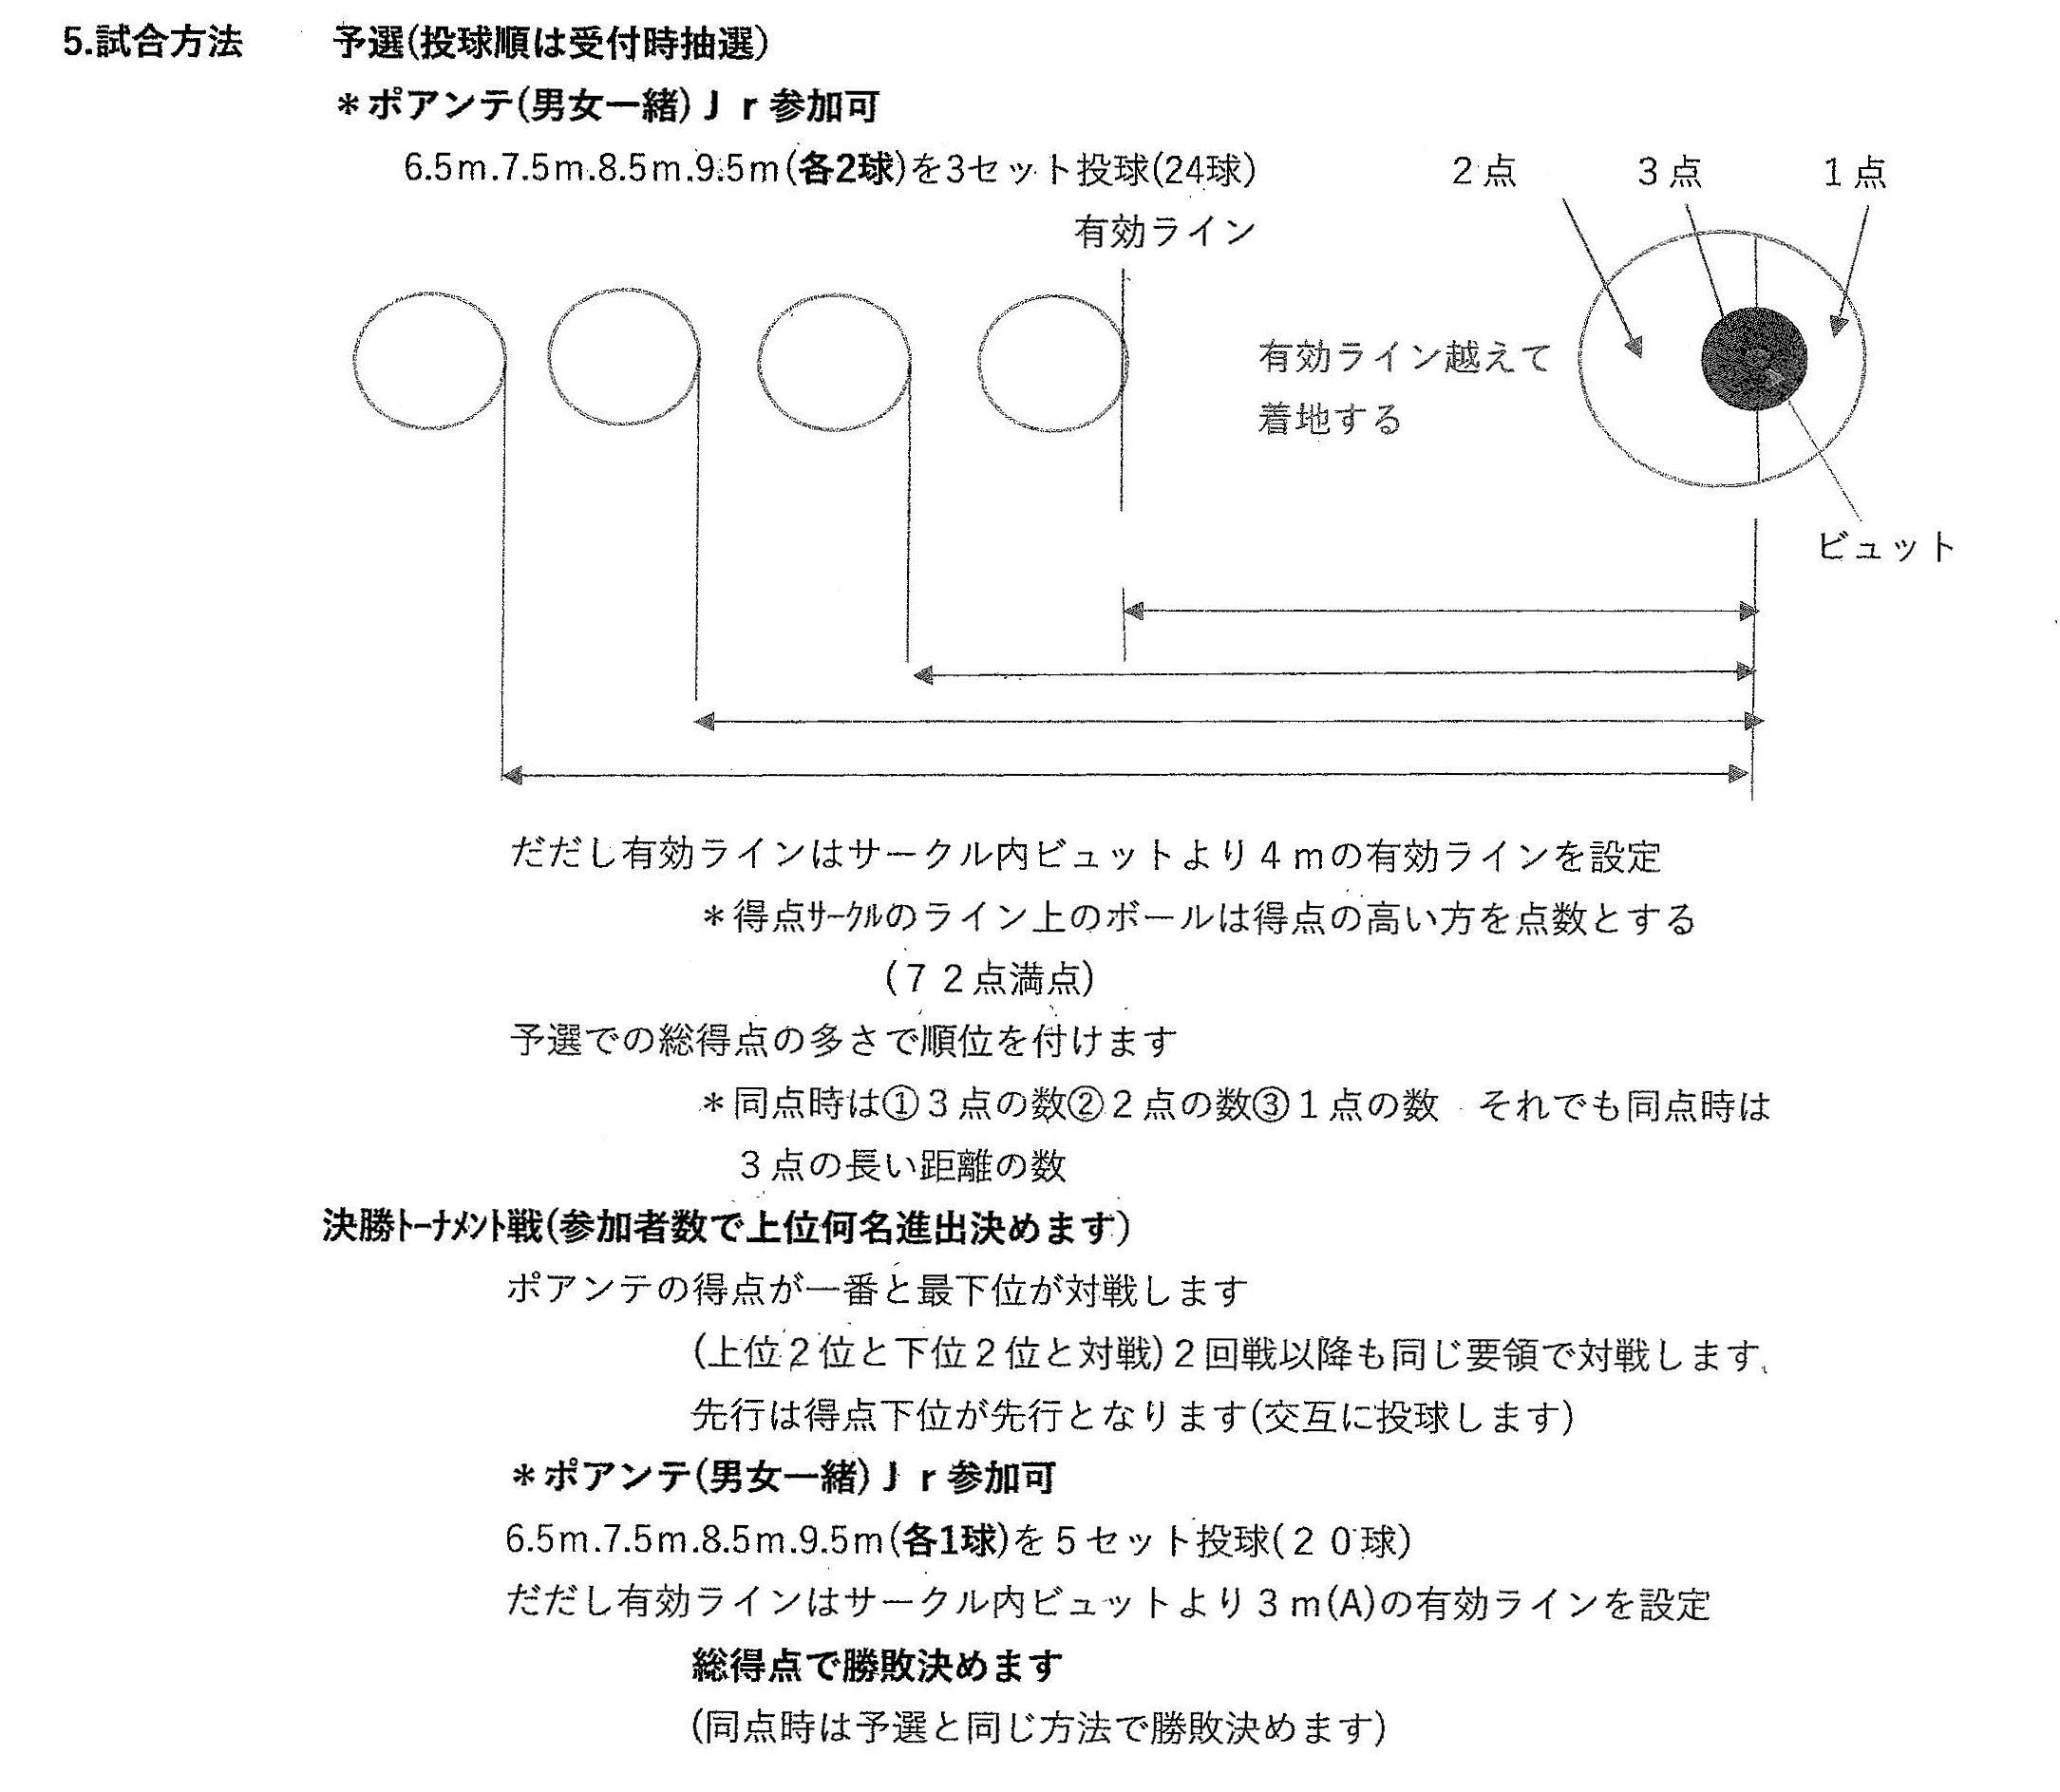 K03.jpg